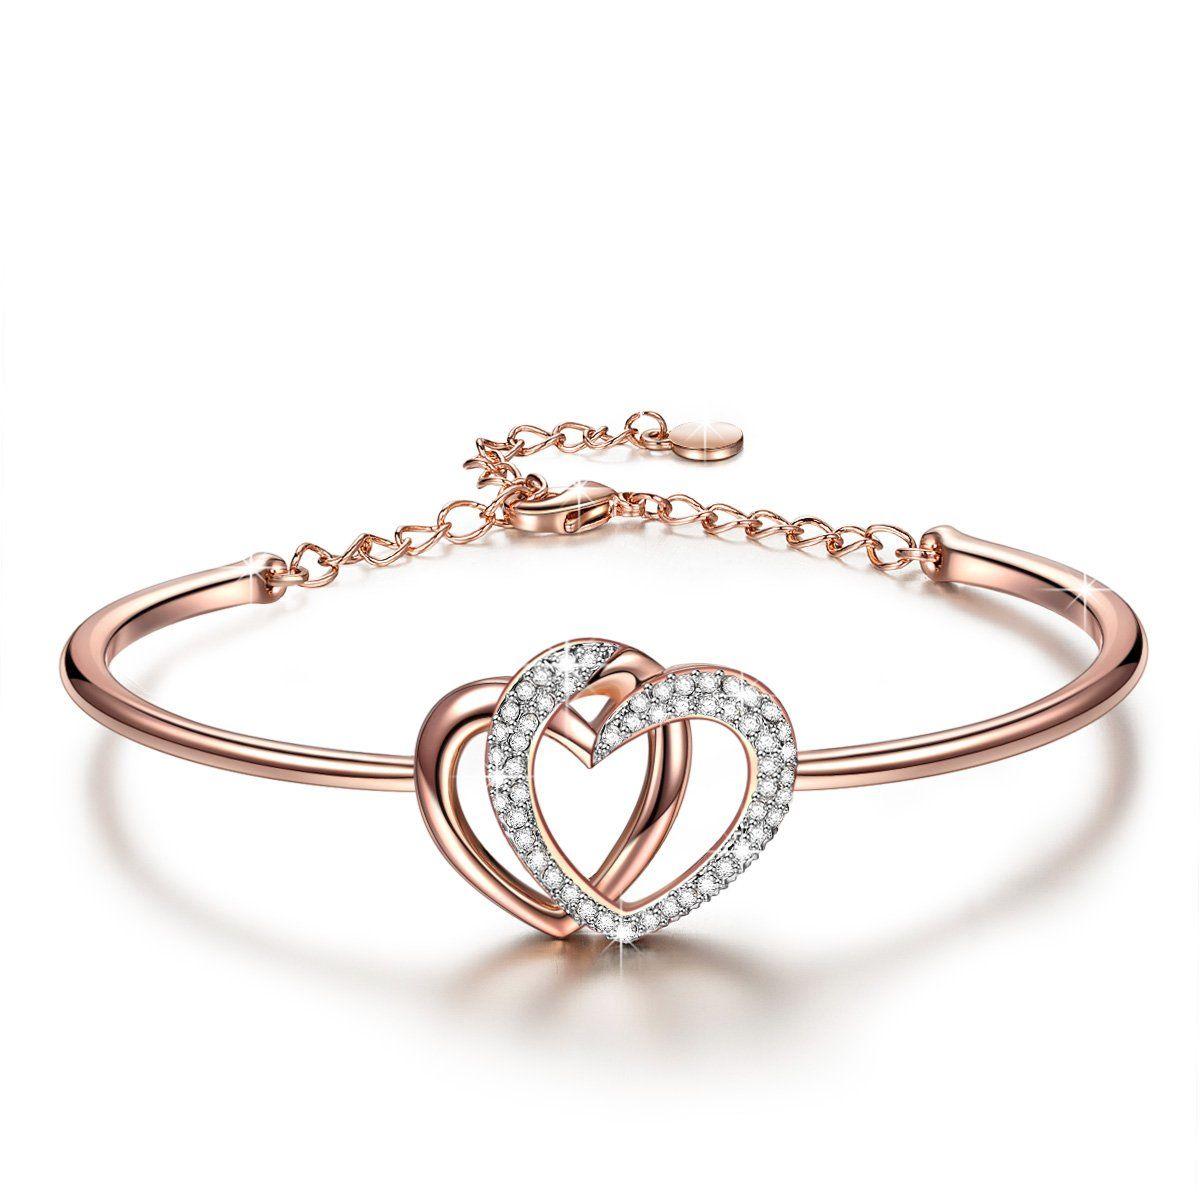 Fashion Women Silver Crystal Bracelet Love Heart Bangle Cuff Jewelry Girl Gift